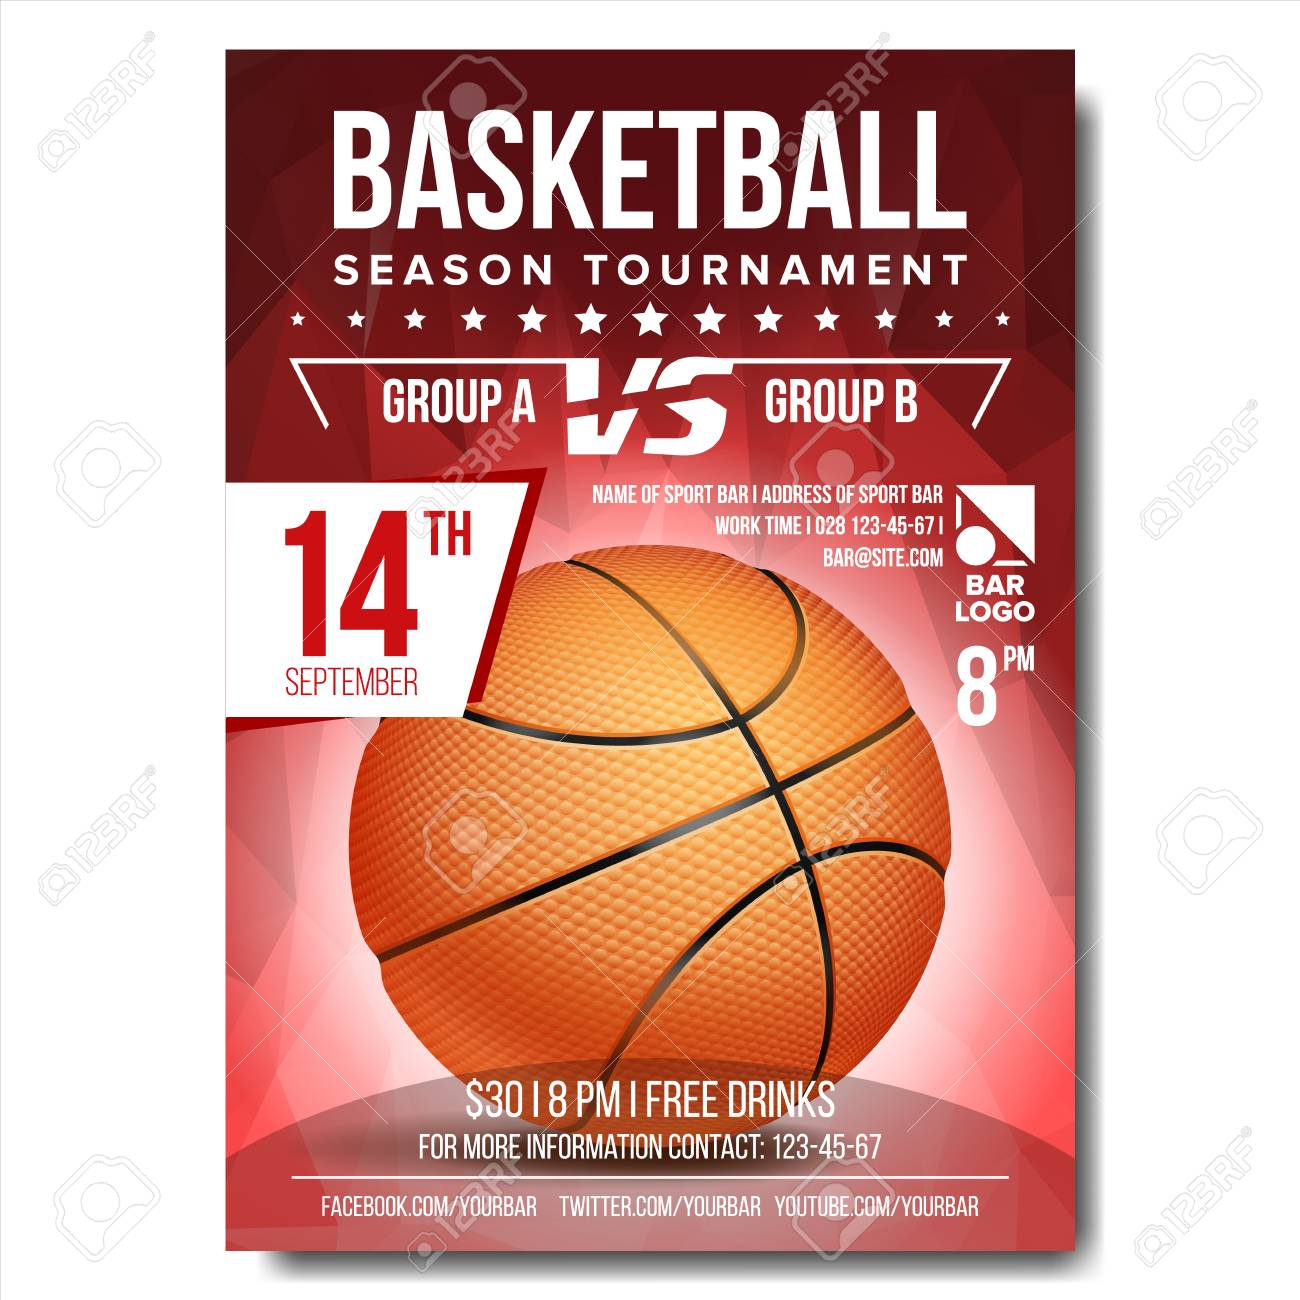 Basketball Poster Vector Basketball Ball Design For Sport Bar